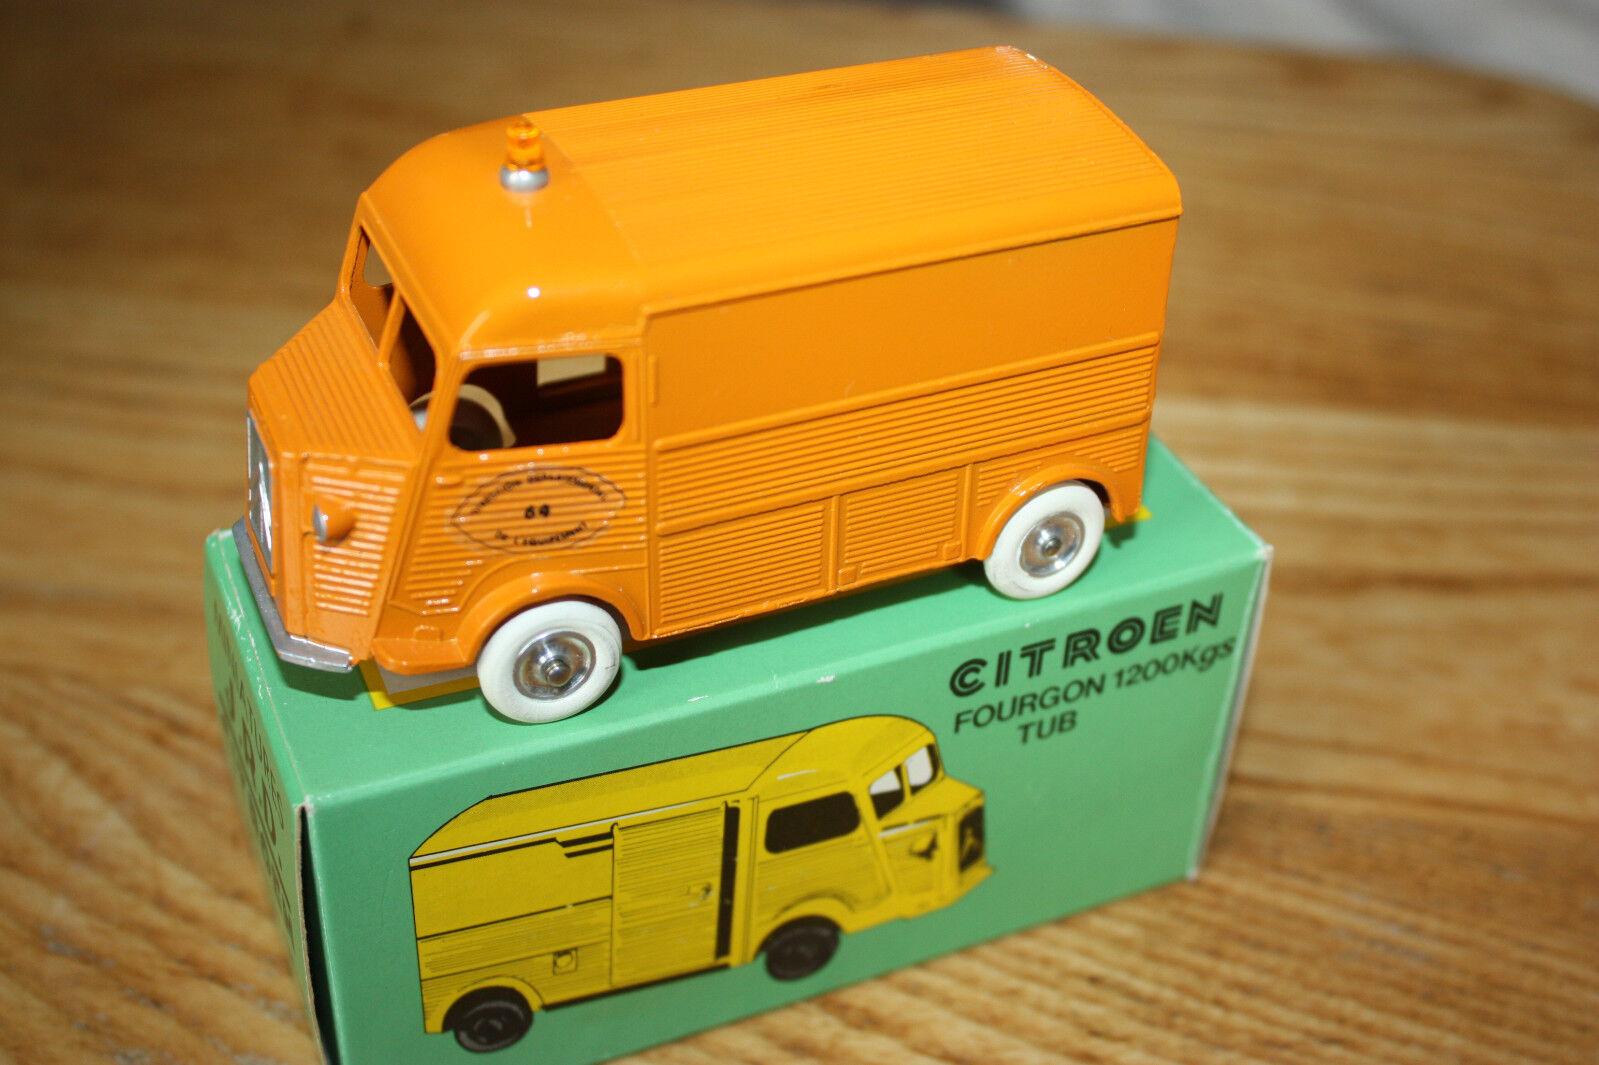 Miniatures JRD France 85 CITROEN 1200 Kg DDE DDE DDE 64 Orange Neuf Boite 1 43 87d70e